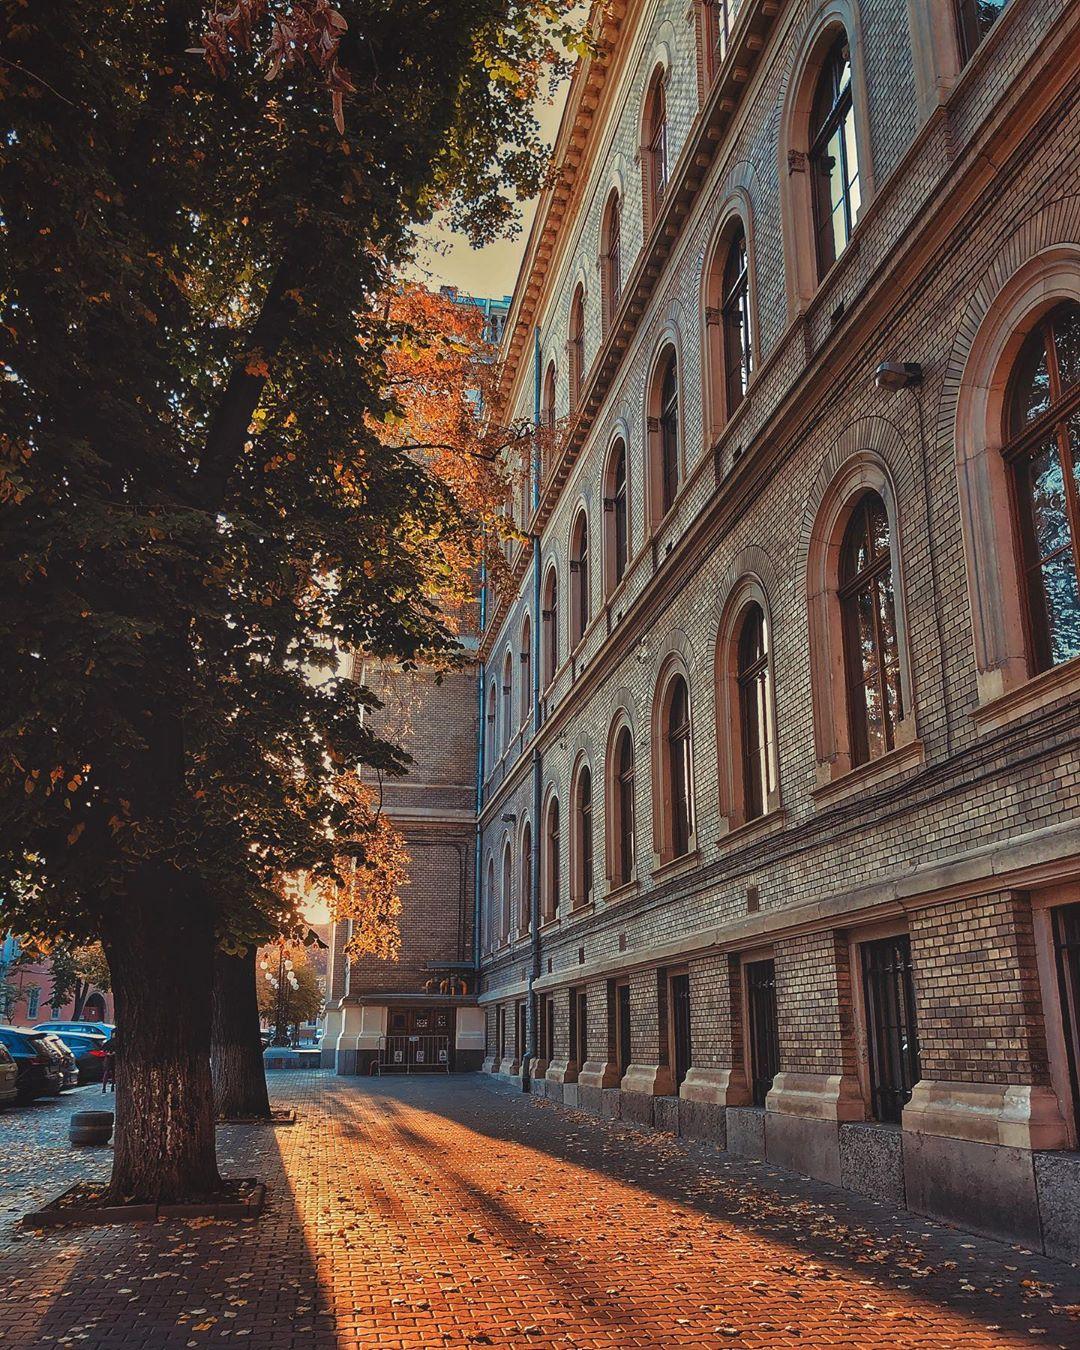 miriam.kenyeres Clujul in 13 fotografii ale lunii octombrie 2019